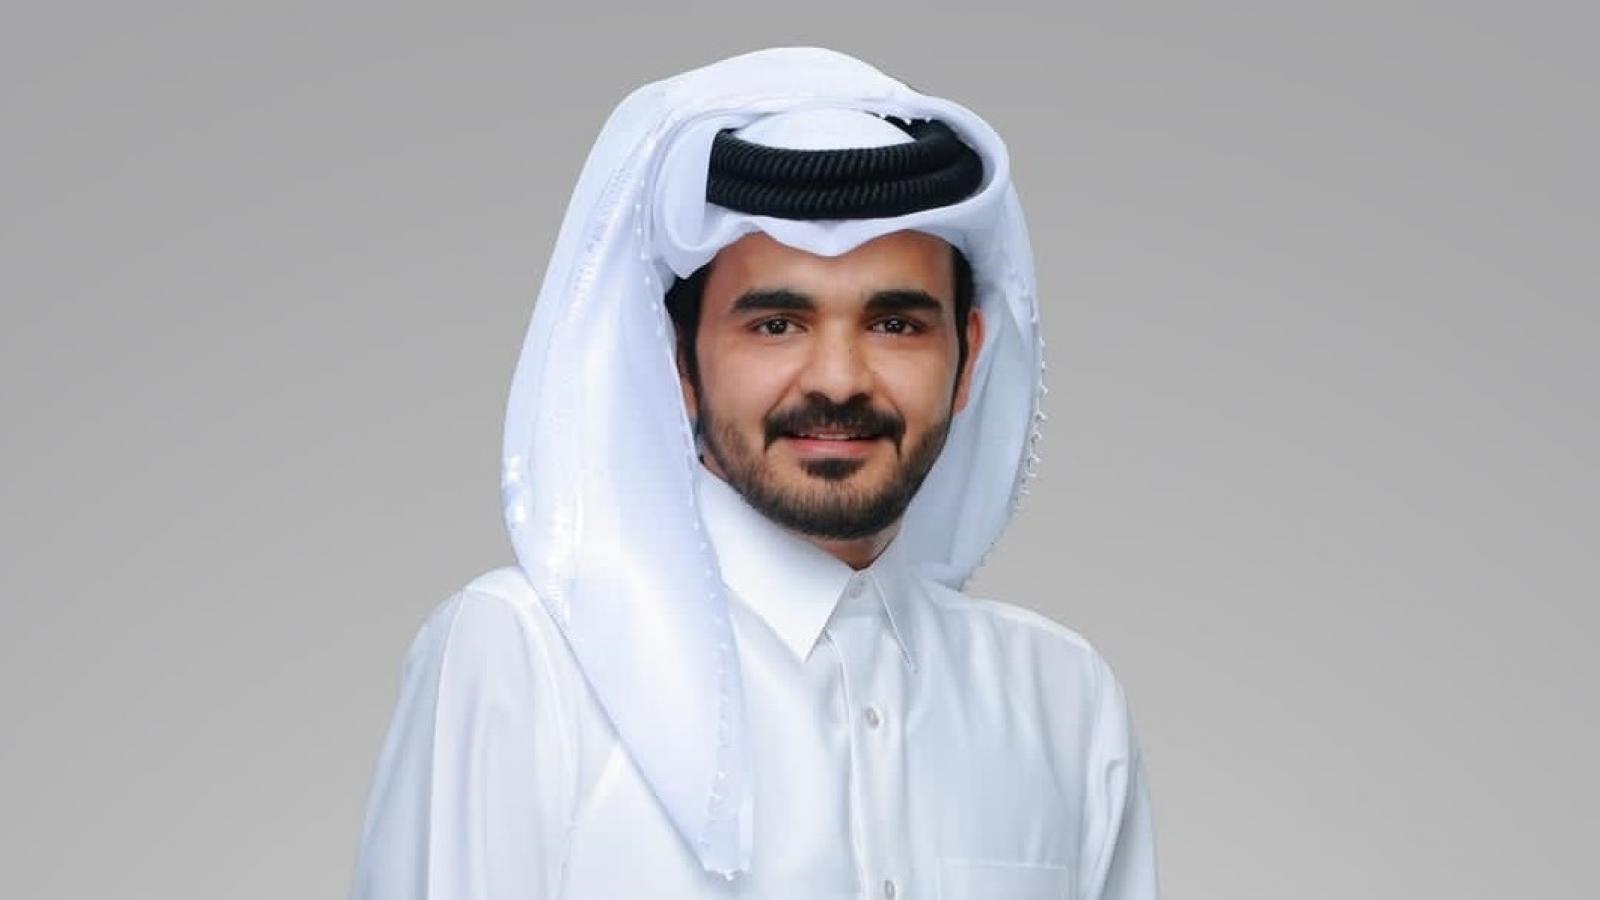 Olympic Refuge Foundation renews membership of HE Sheikh Joaan bin Hamad Al Thani for four years